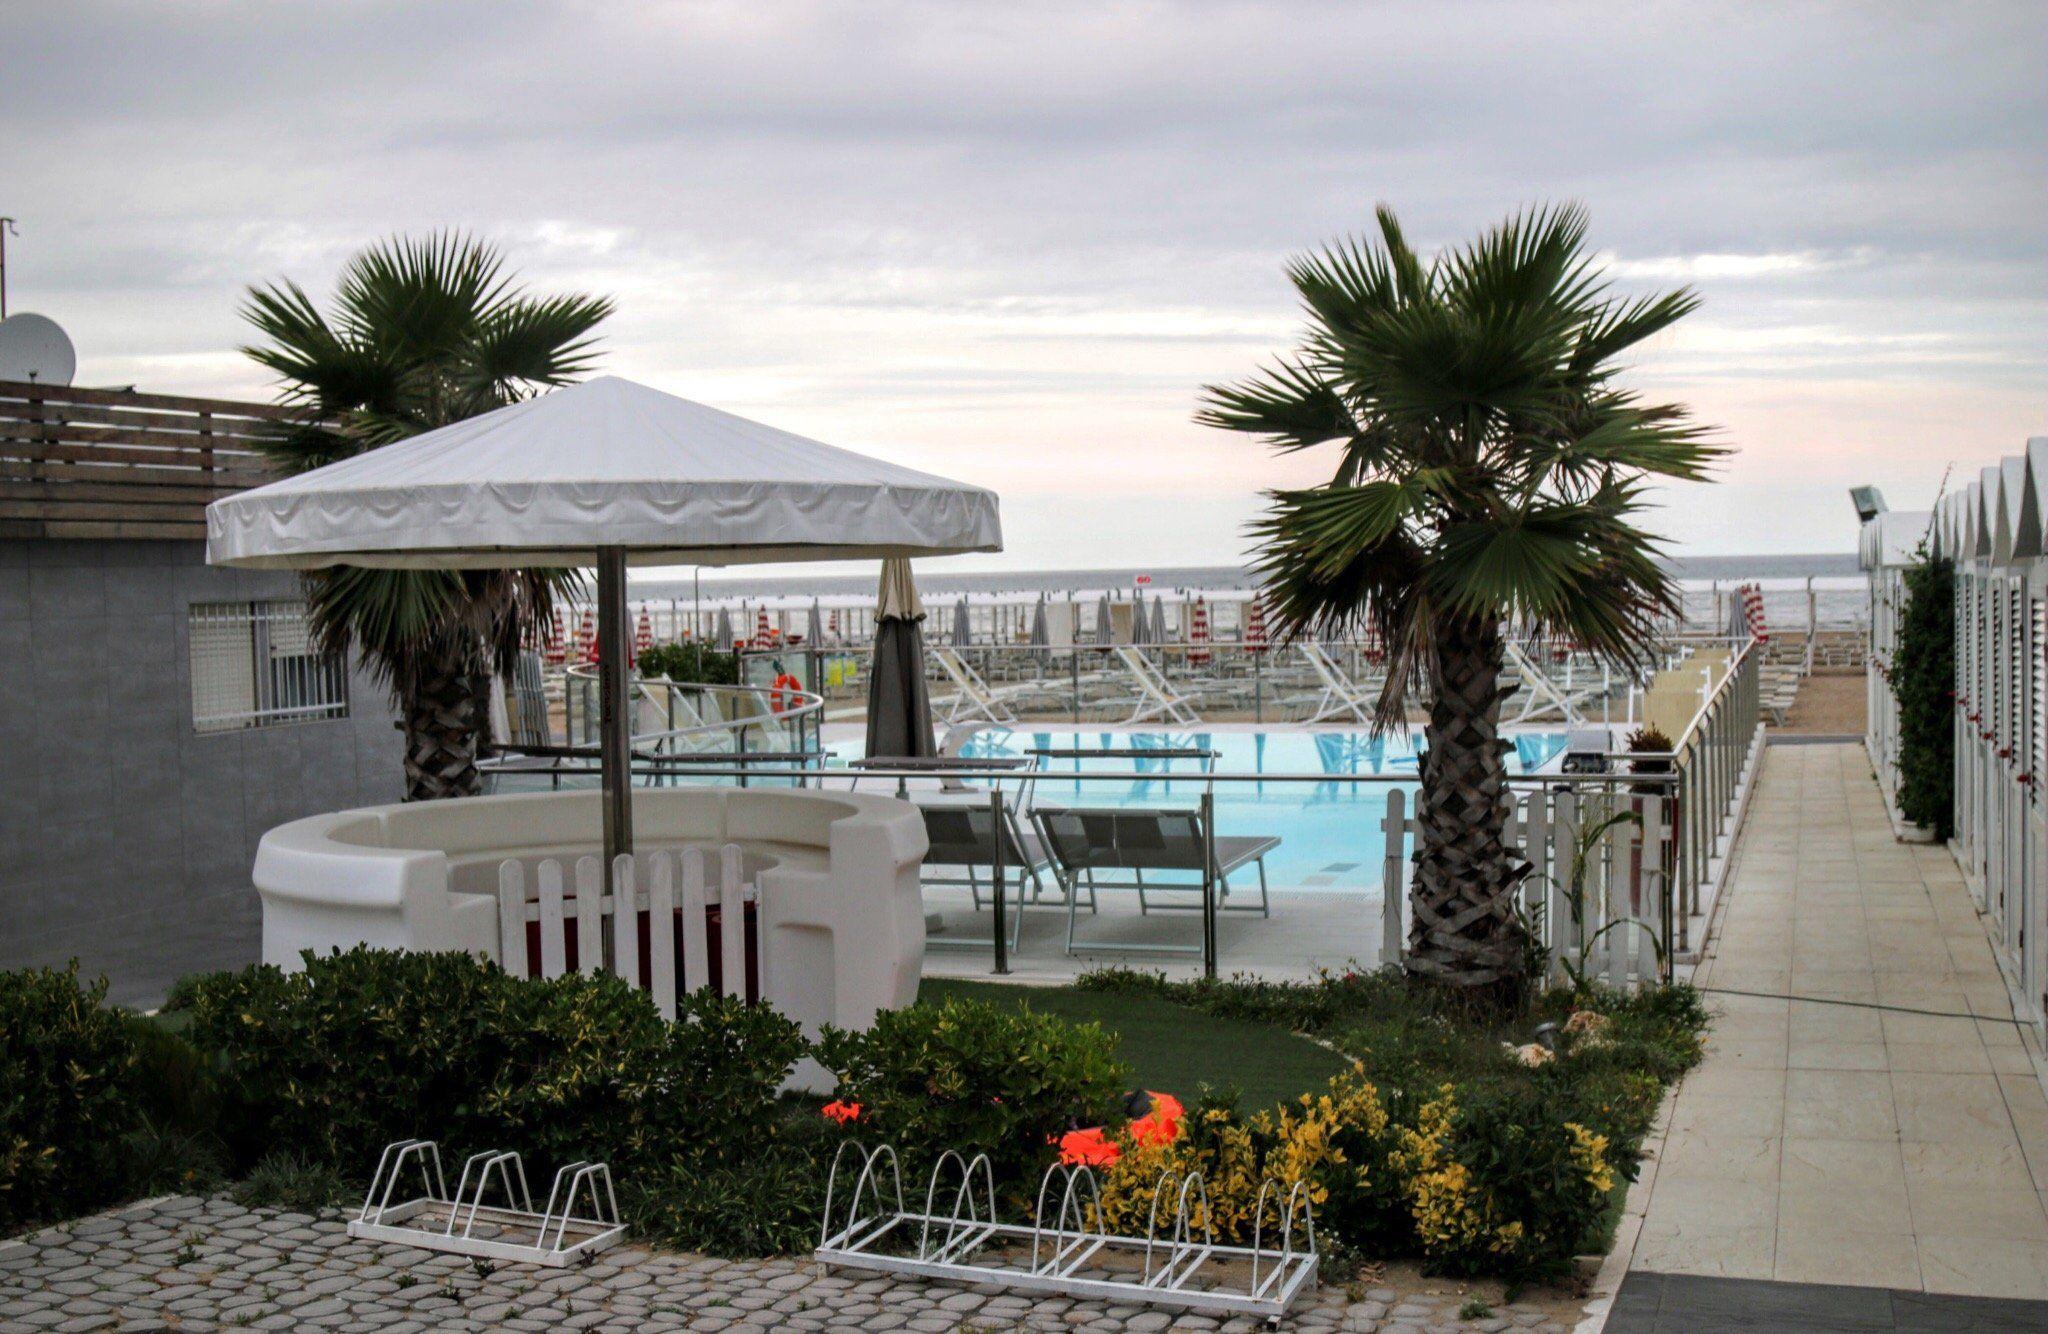 Spiaggia 60 Riccione (Italy): Top Tips Before You Go - TripAdvisor ...